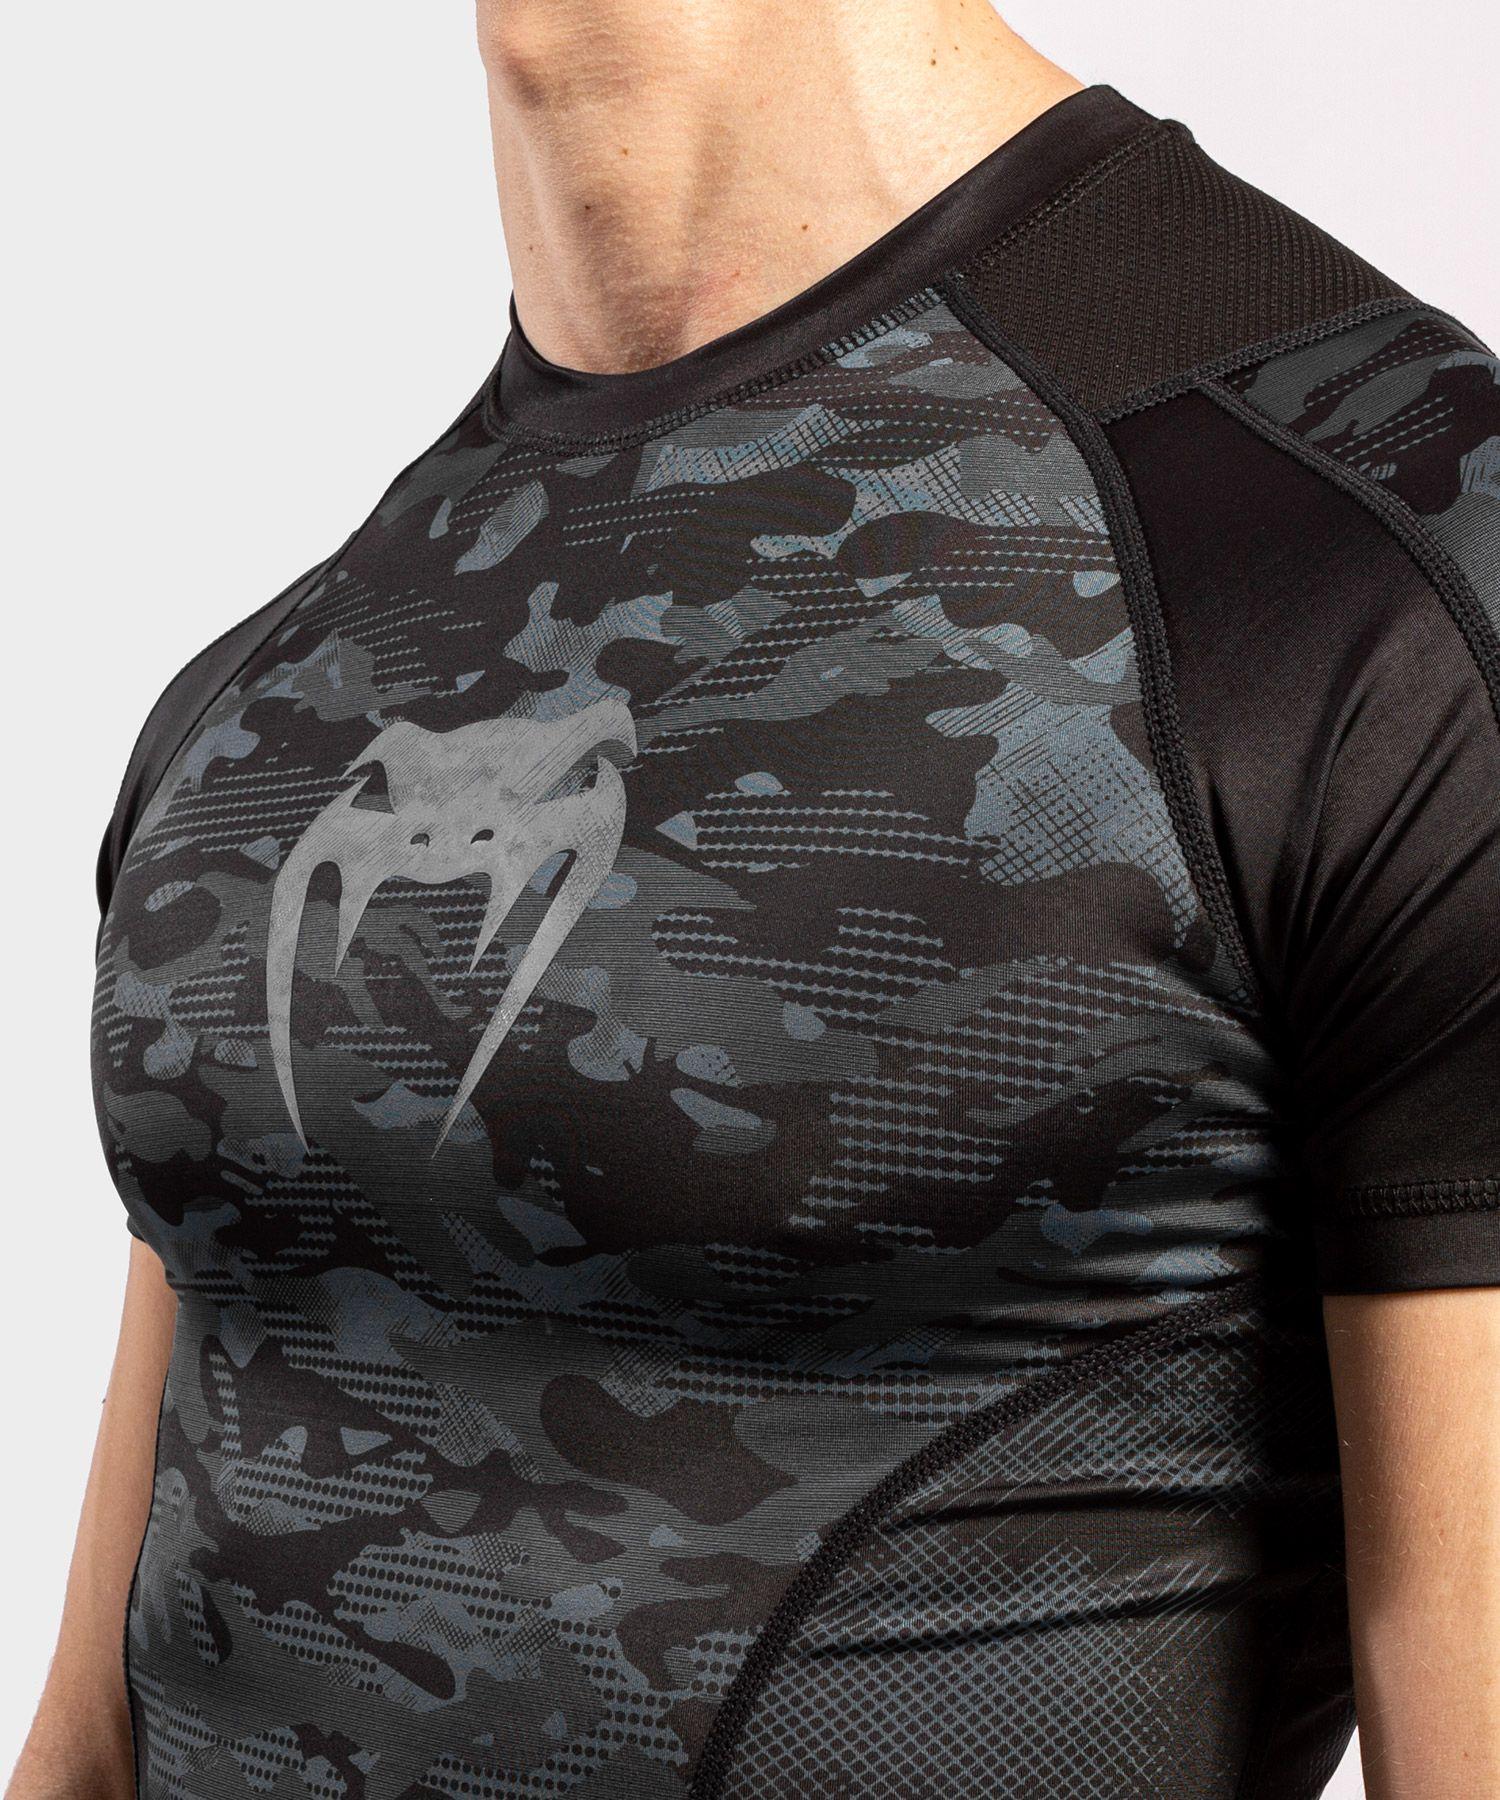 Venum Defender Short Sleeve Rashguard - Dark camo